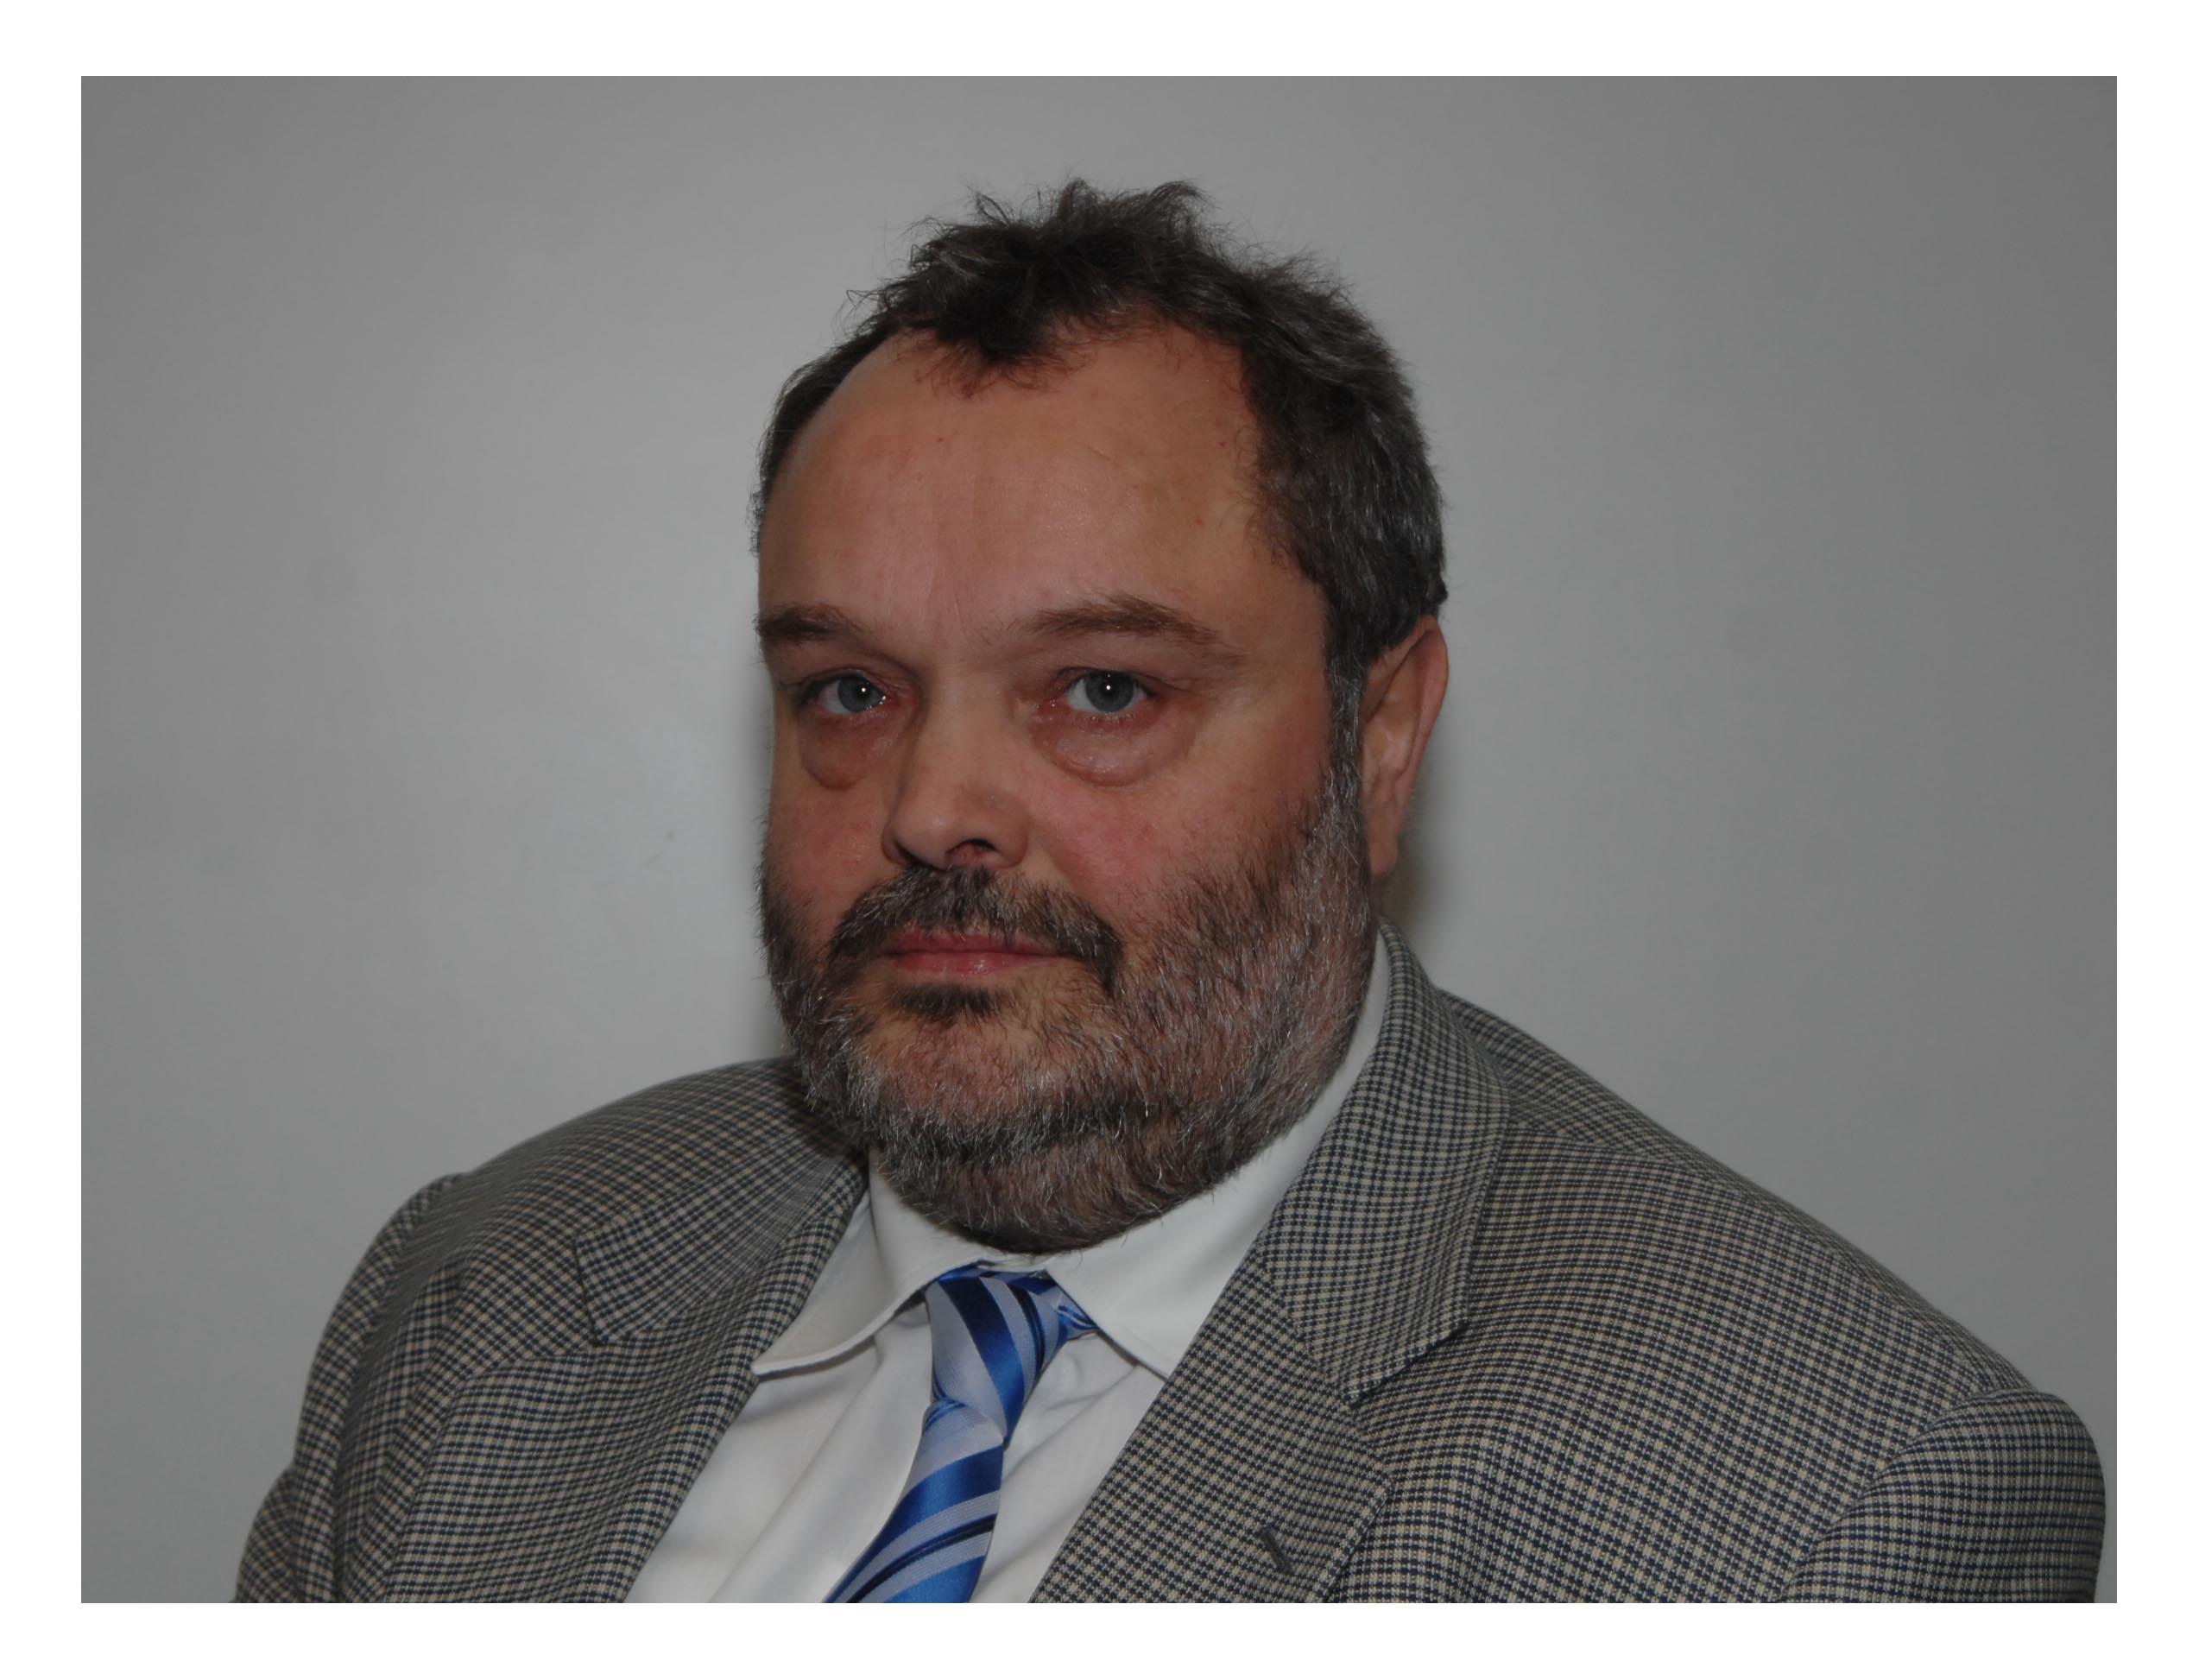 Peter_Dippel_General Manager per l'Italia Mcinnon&Clarke